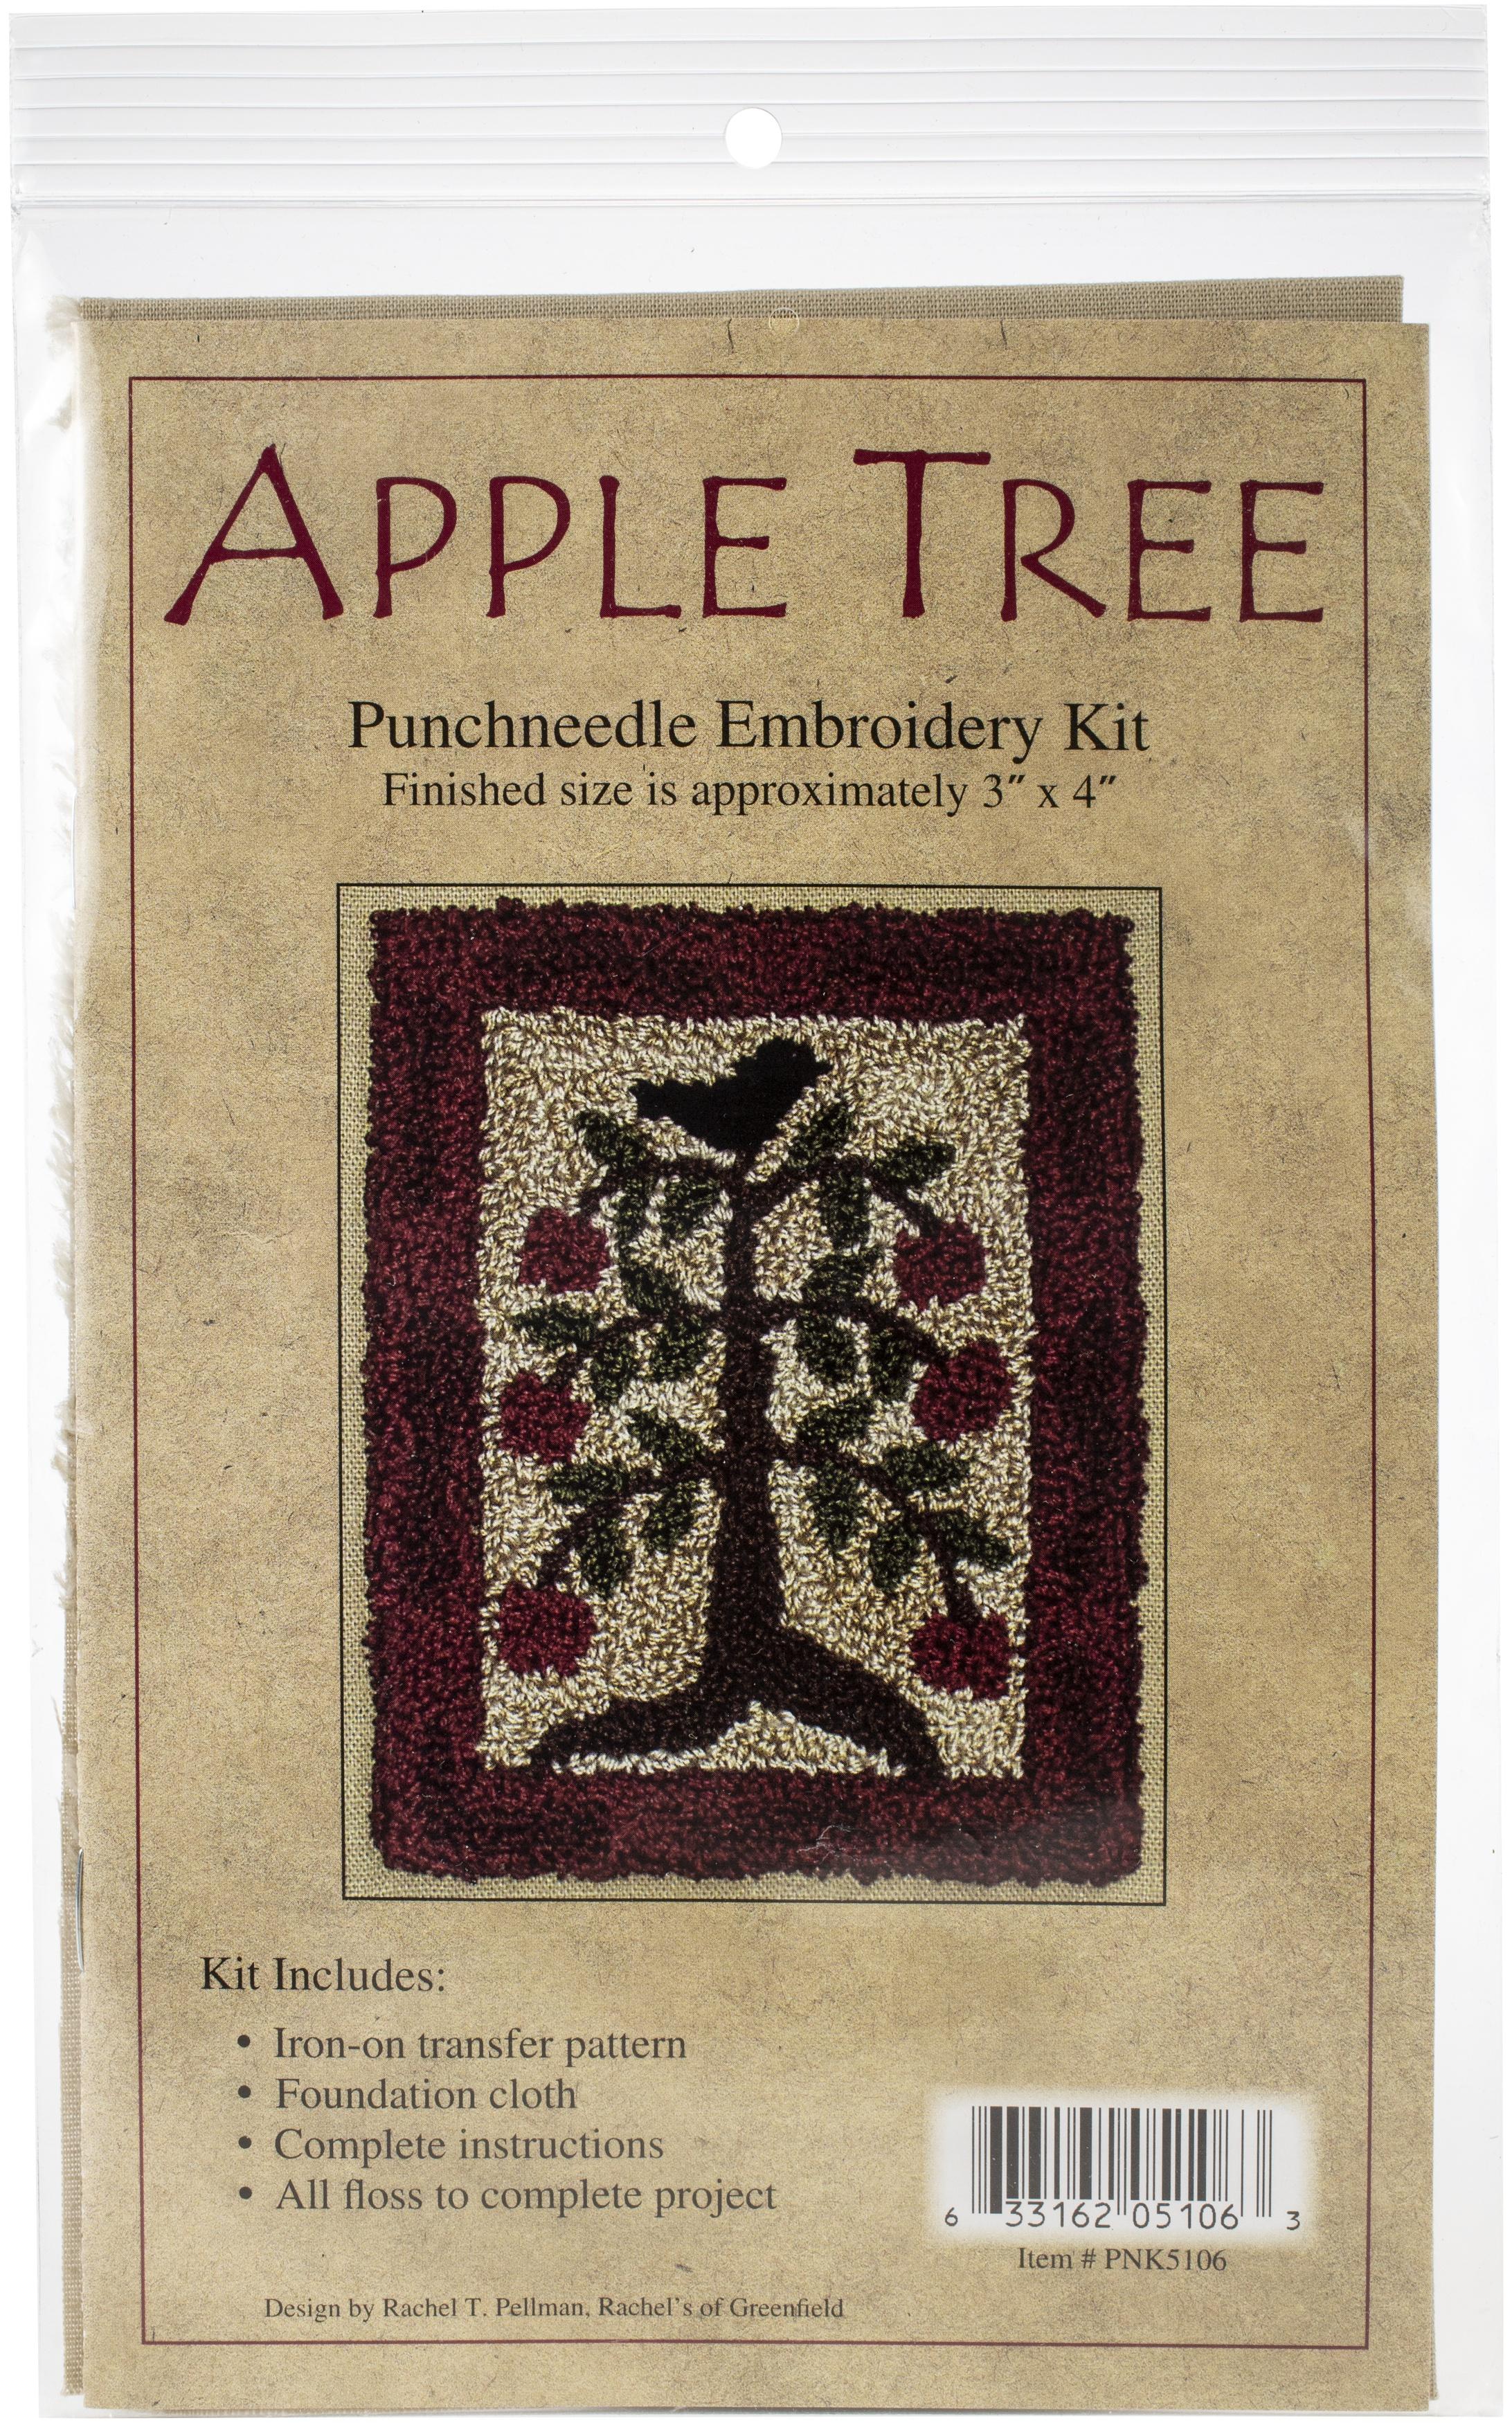 Apple Tree Punchneedle